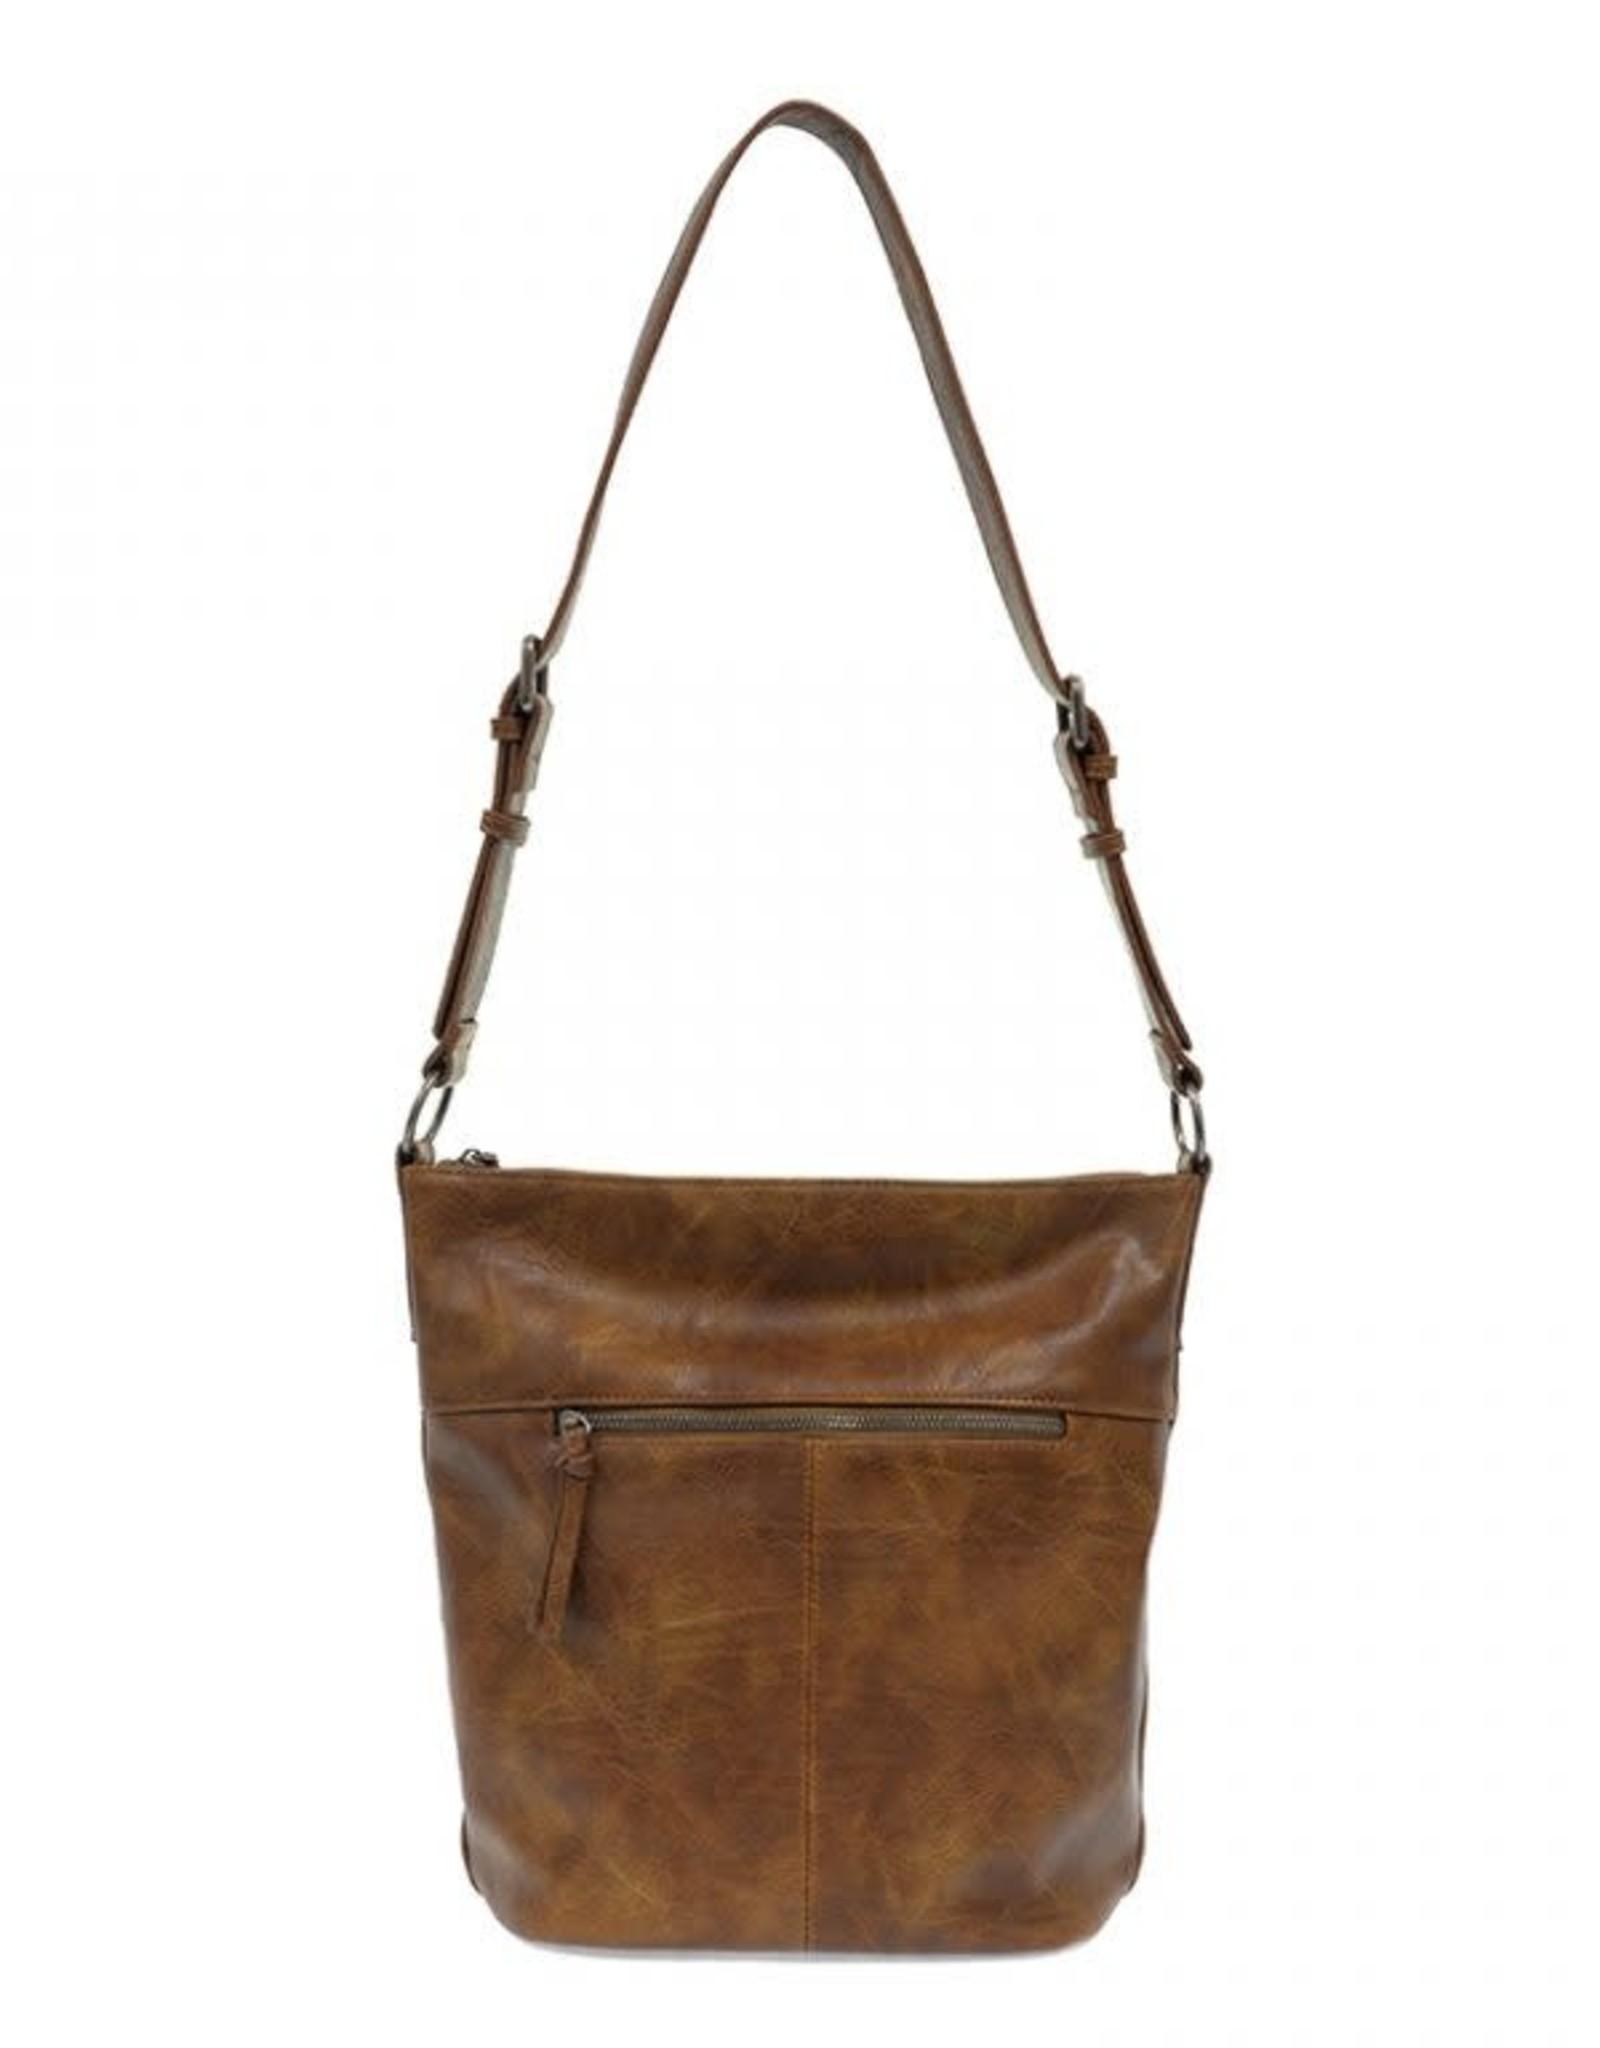 Joy Susan Nori Crossbody Bucket Bag 3 Colors